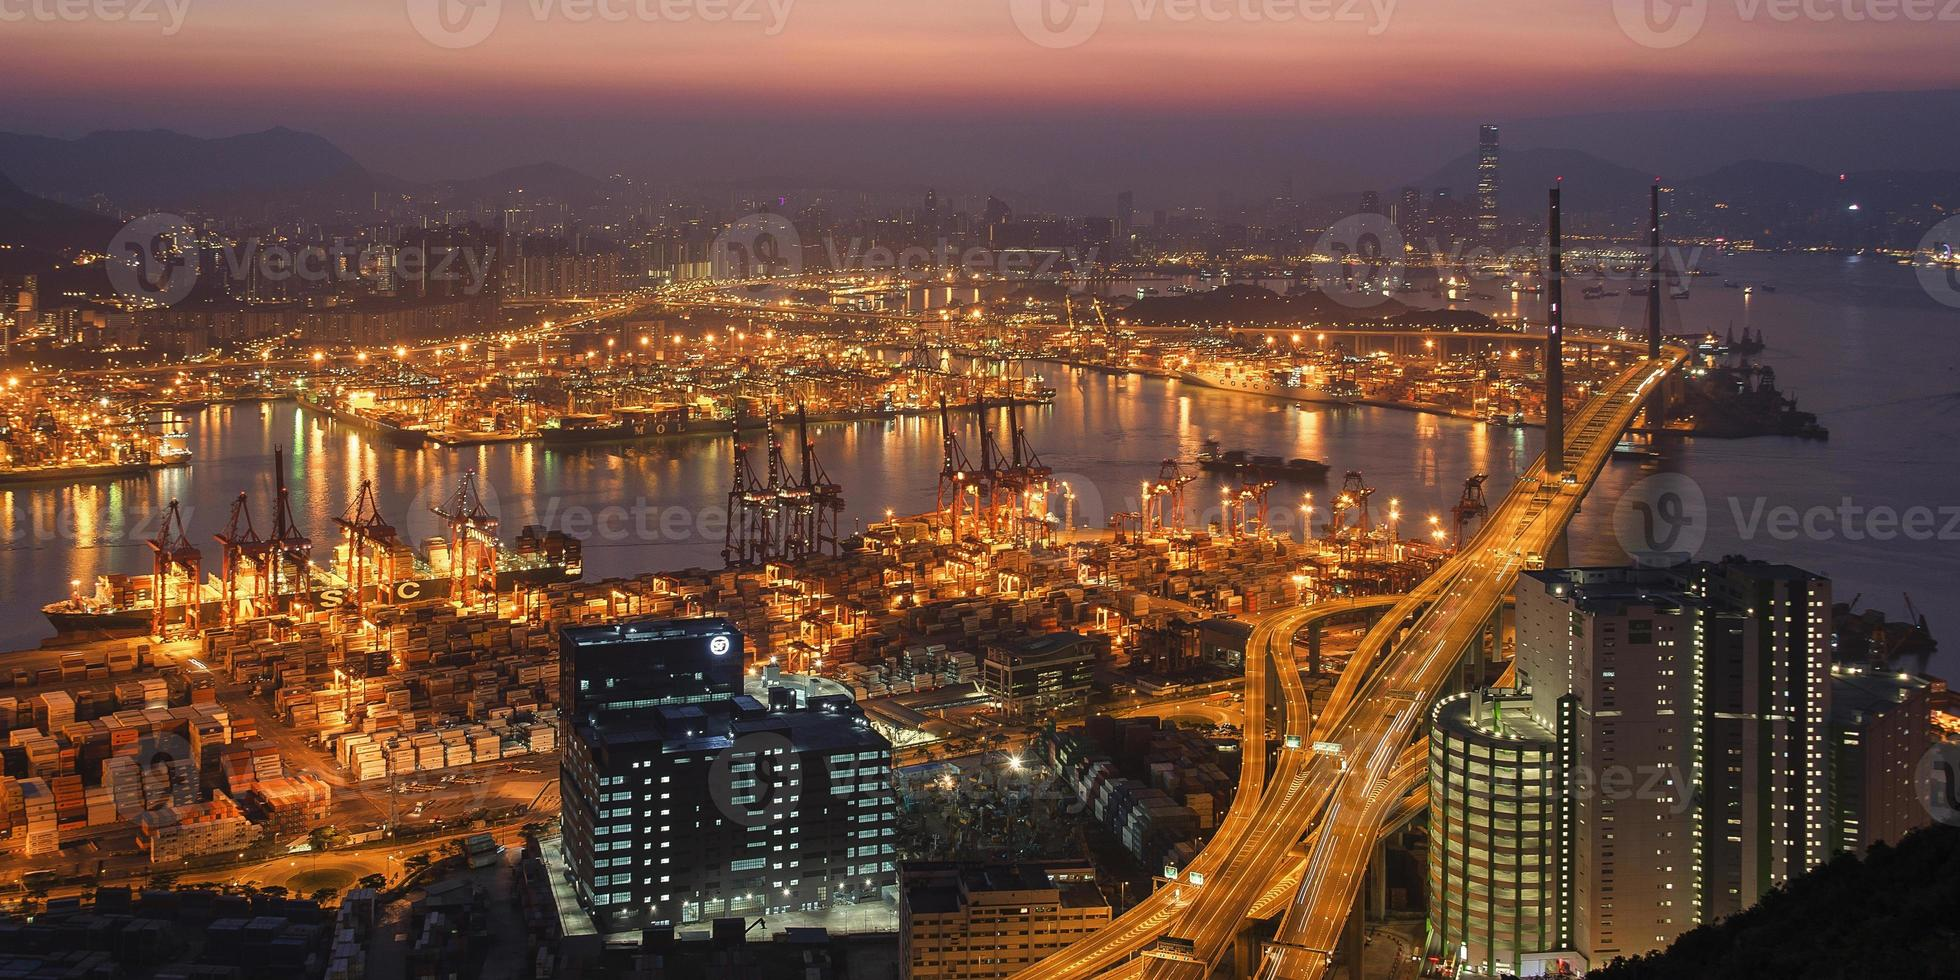 paesaggio urbano di Hong Kong all'alba foto